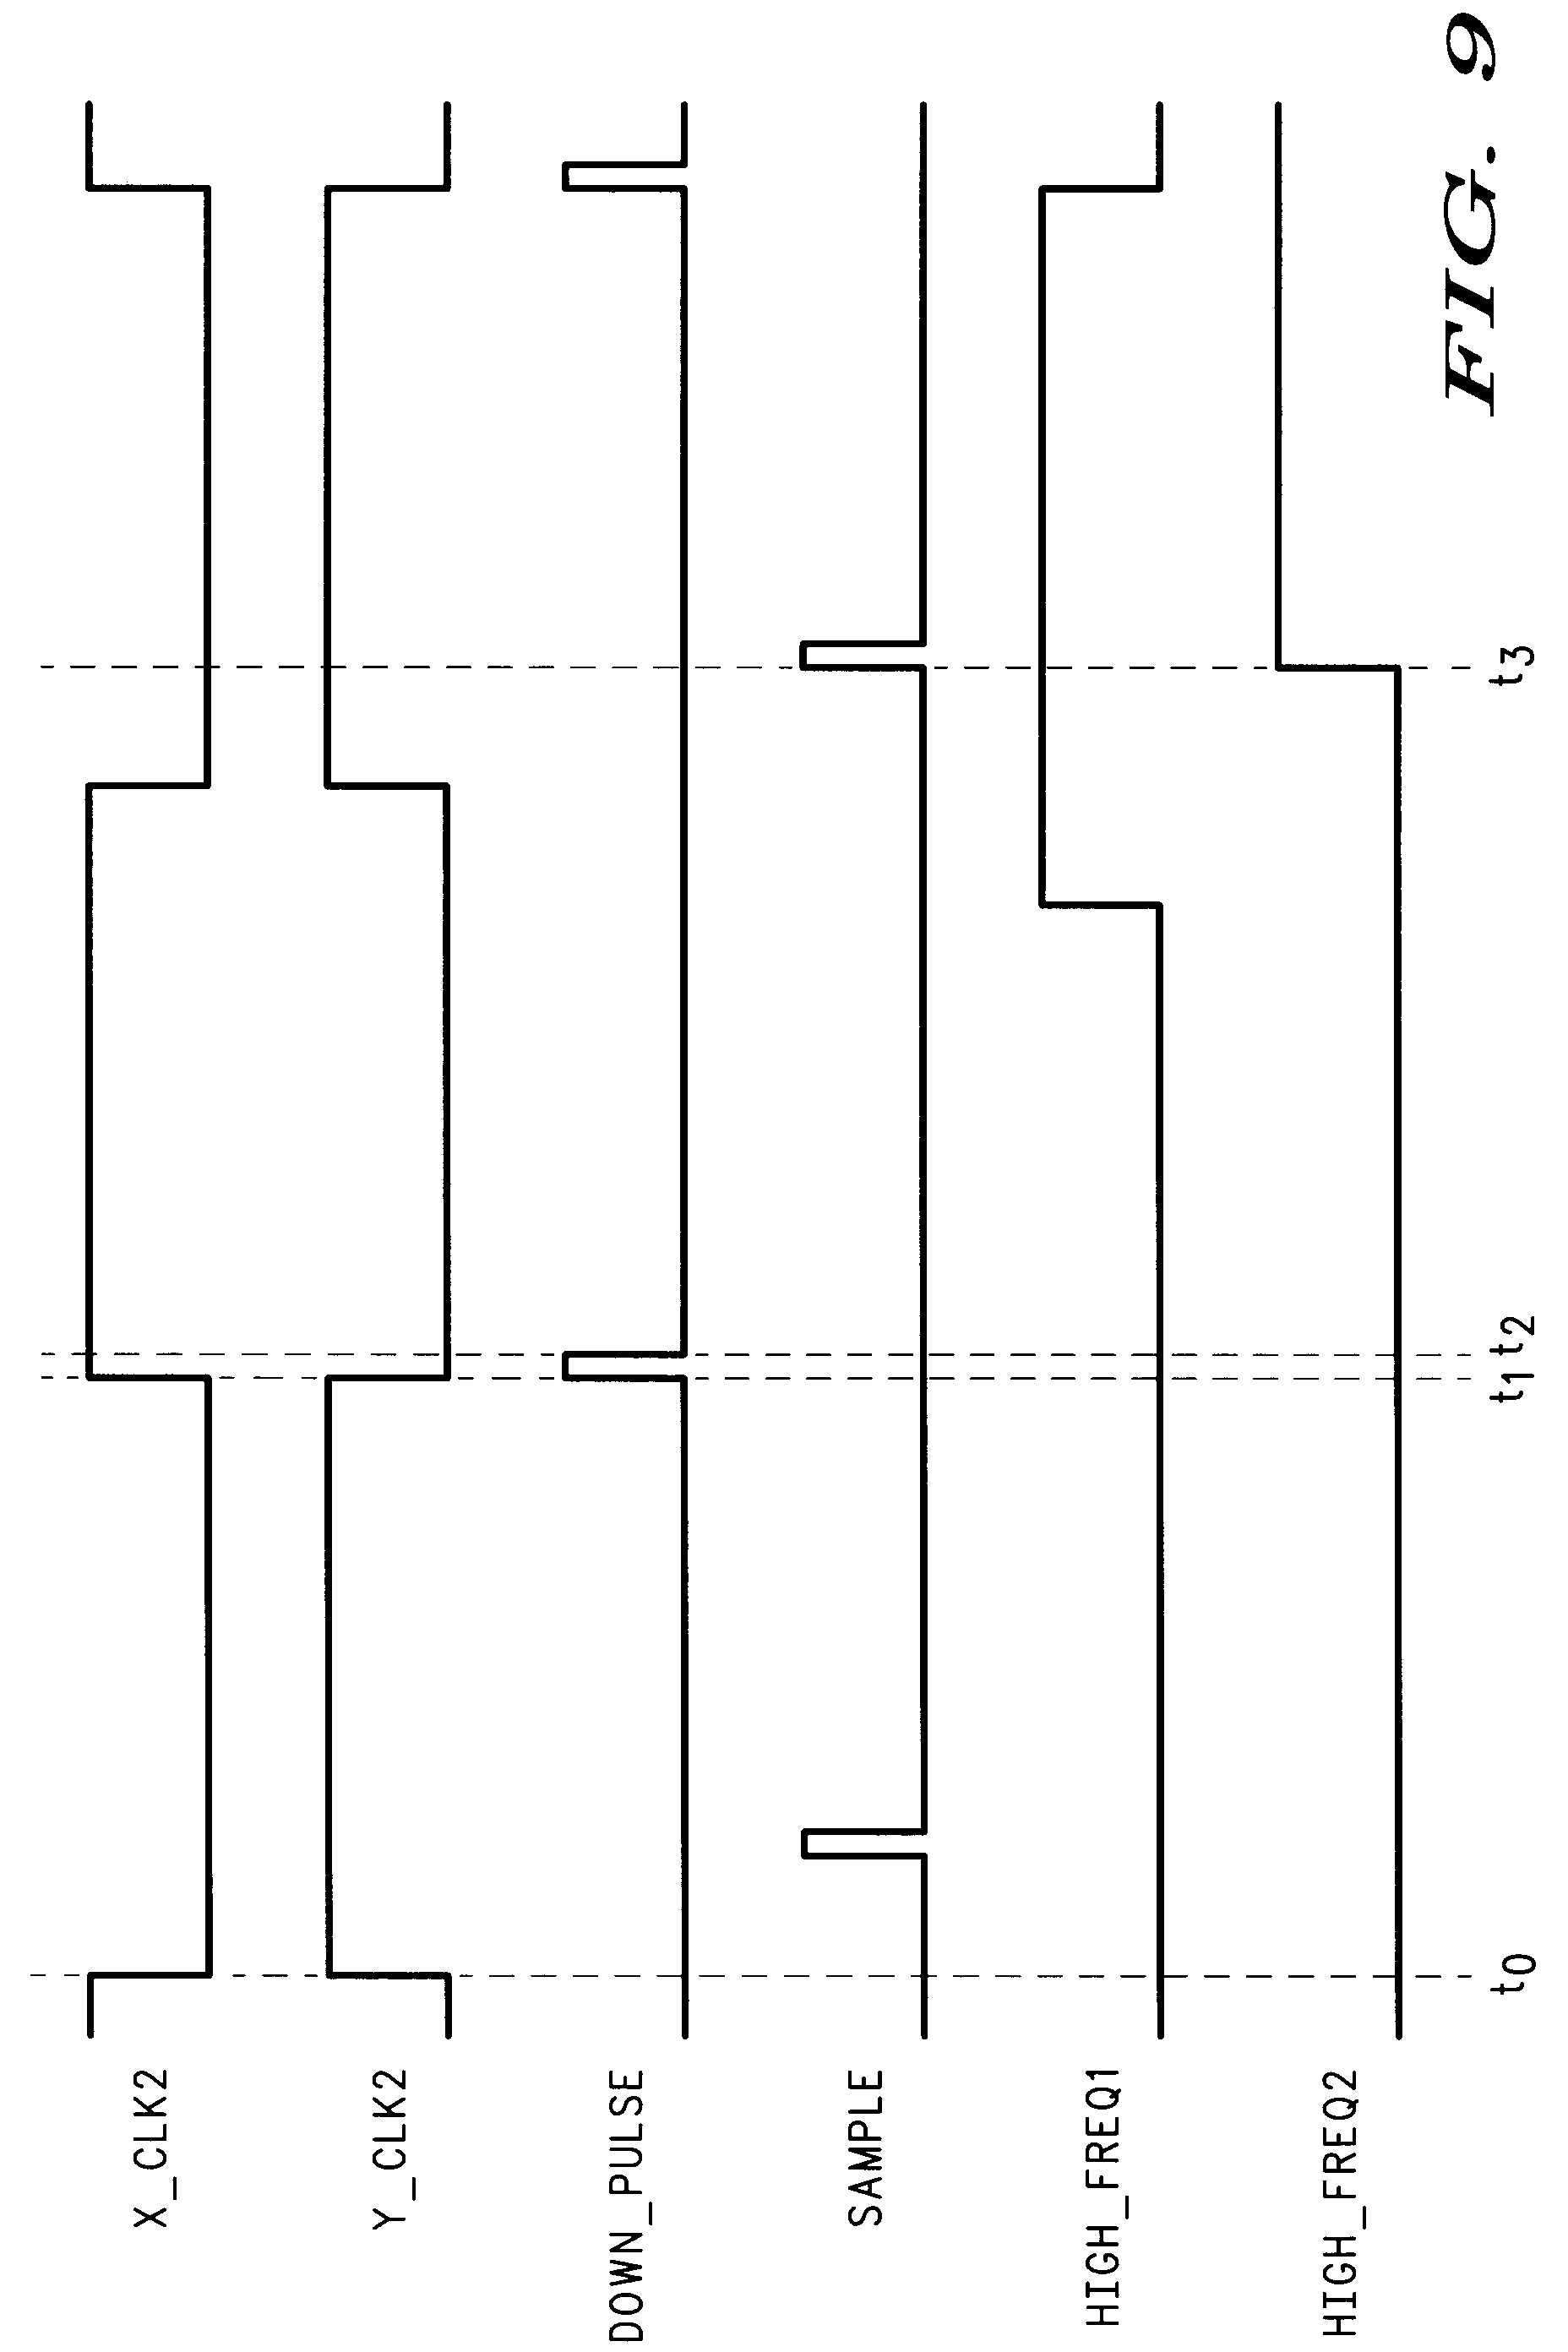 专利ep0598259a1 - frequency